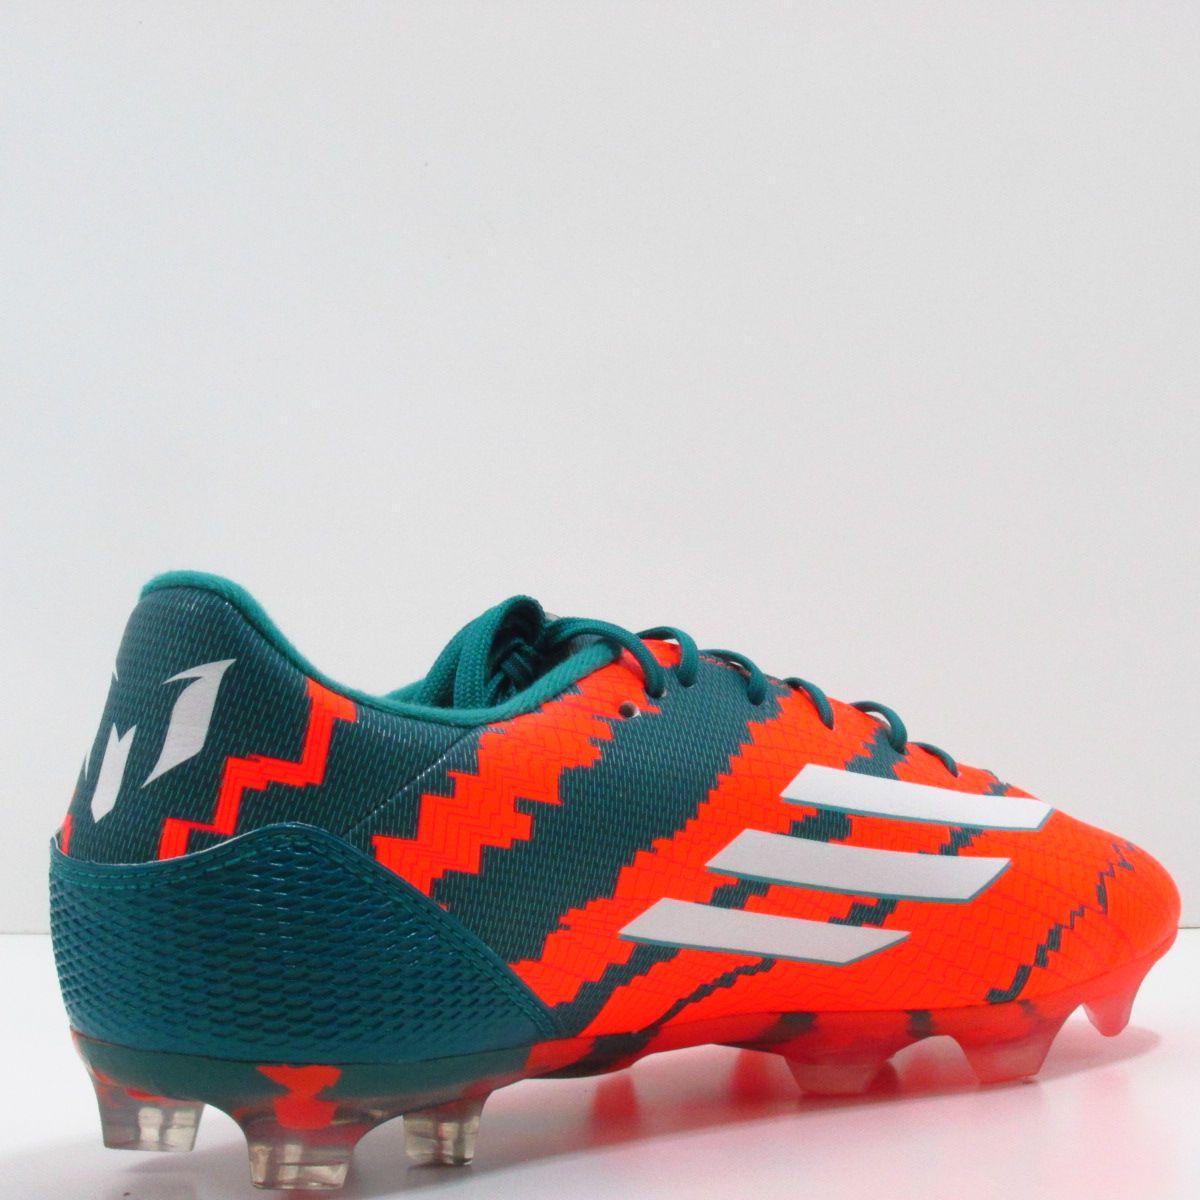 Chuteira Adidas F30 Messi 10.2 FG